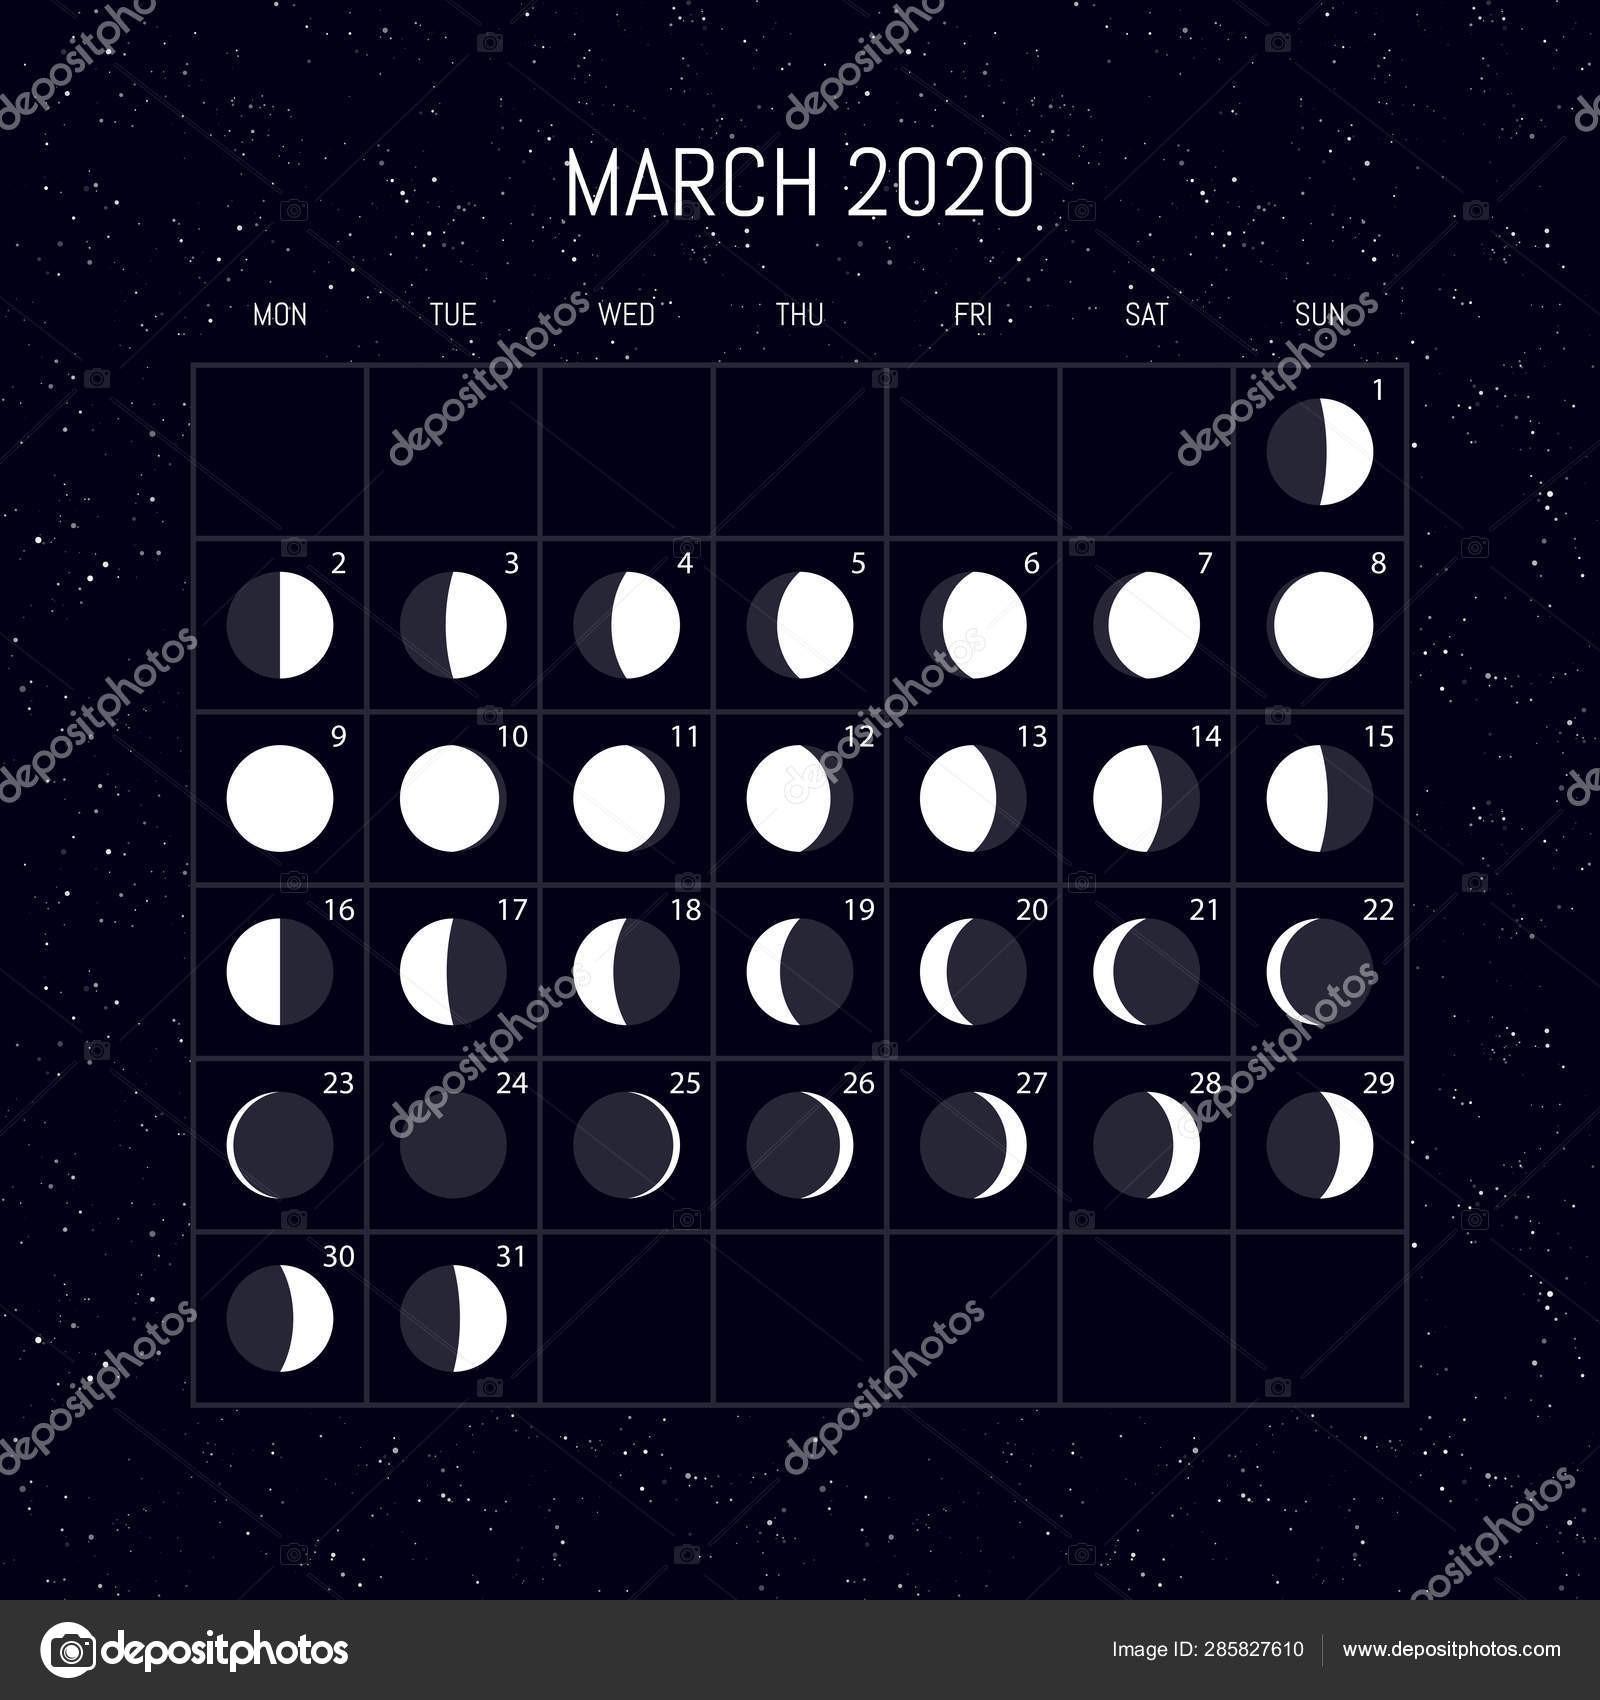 depositphotos stock illustration moon phases calendar for 2020